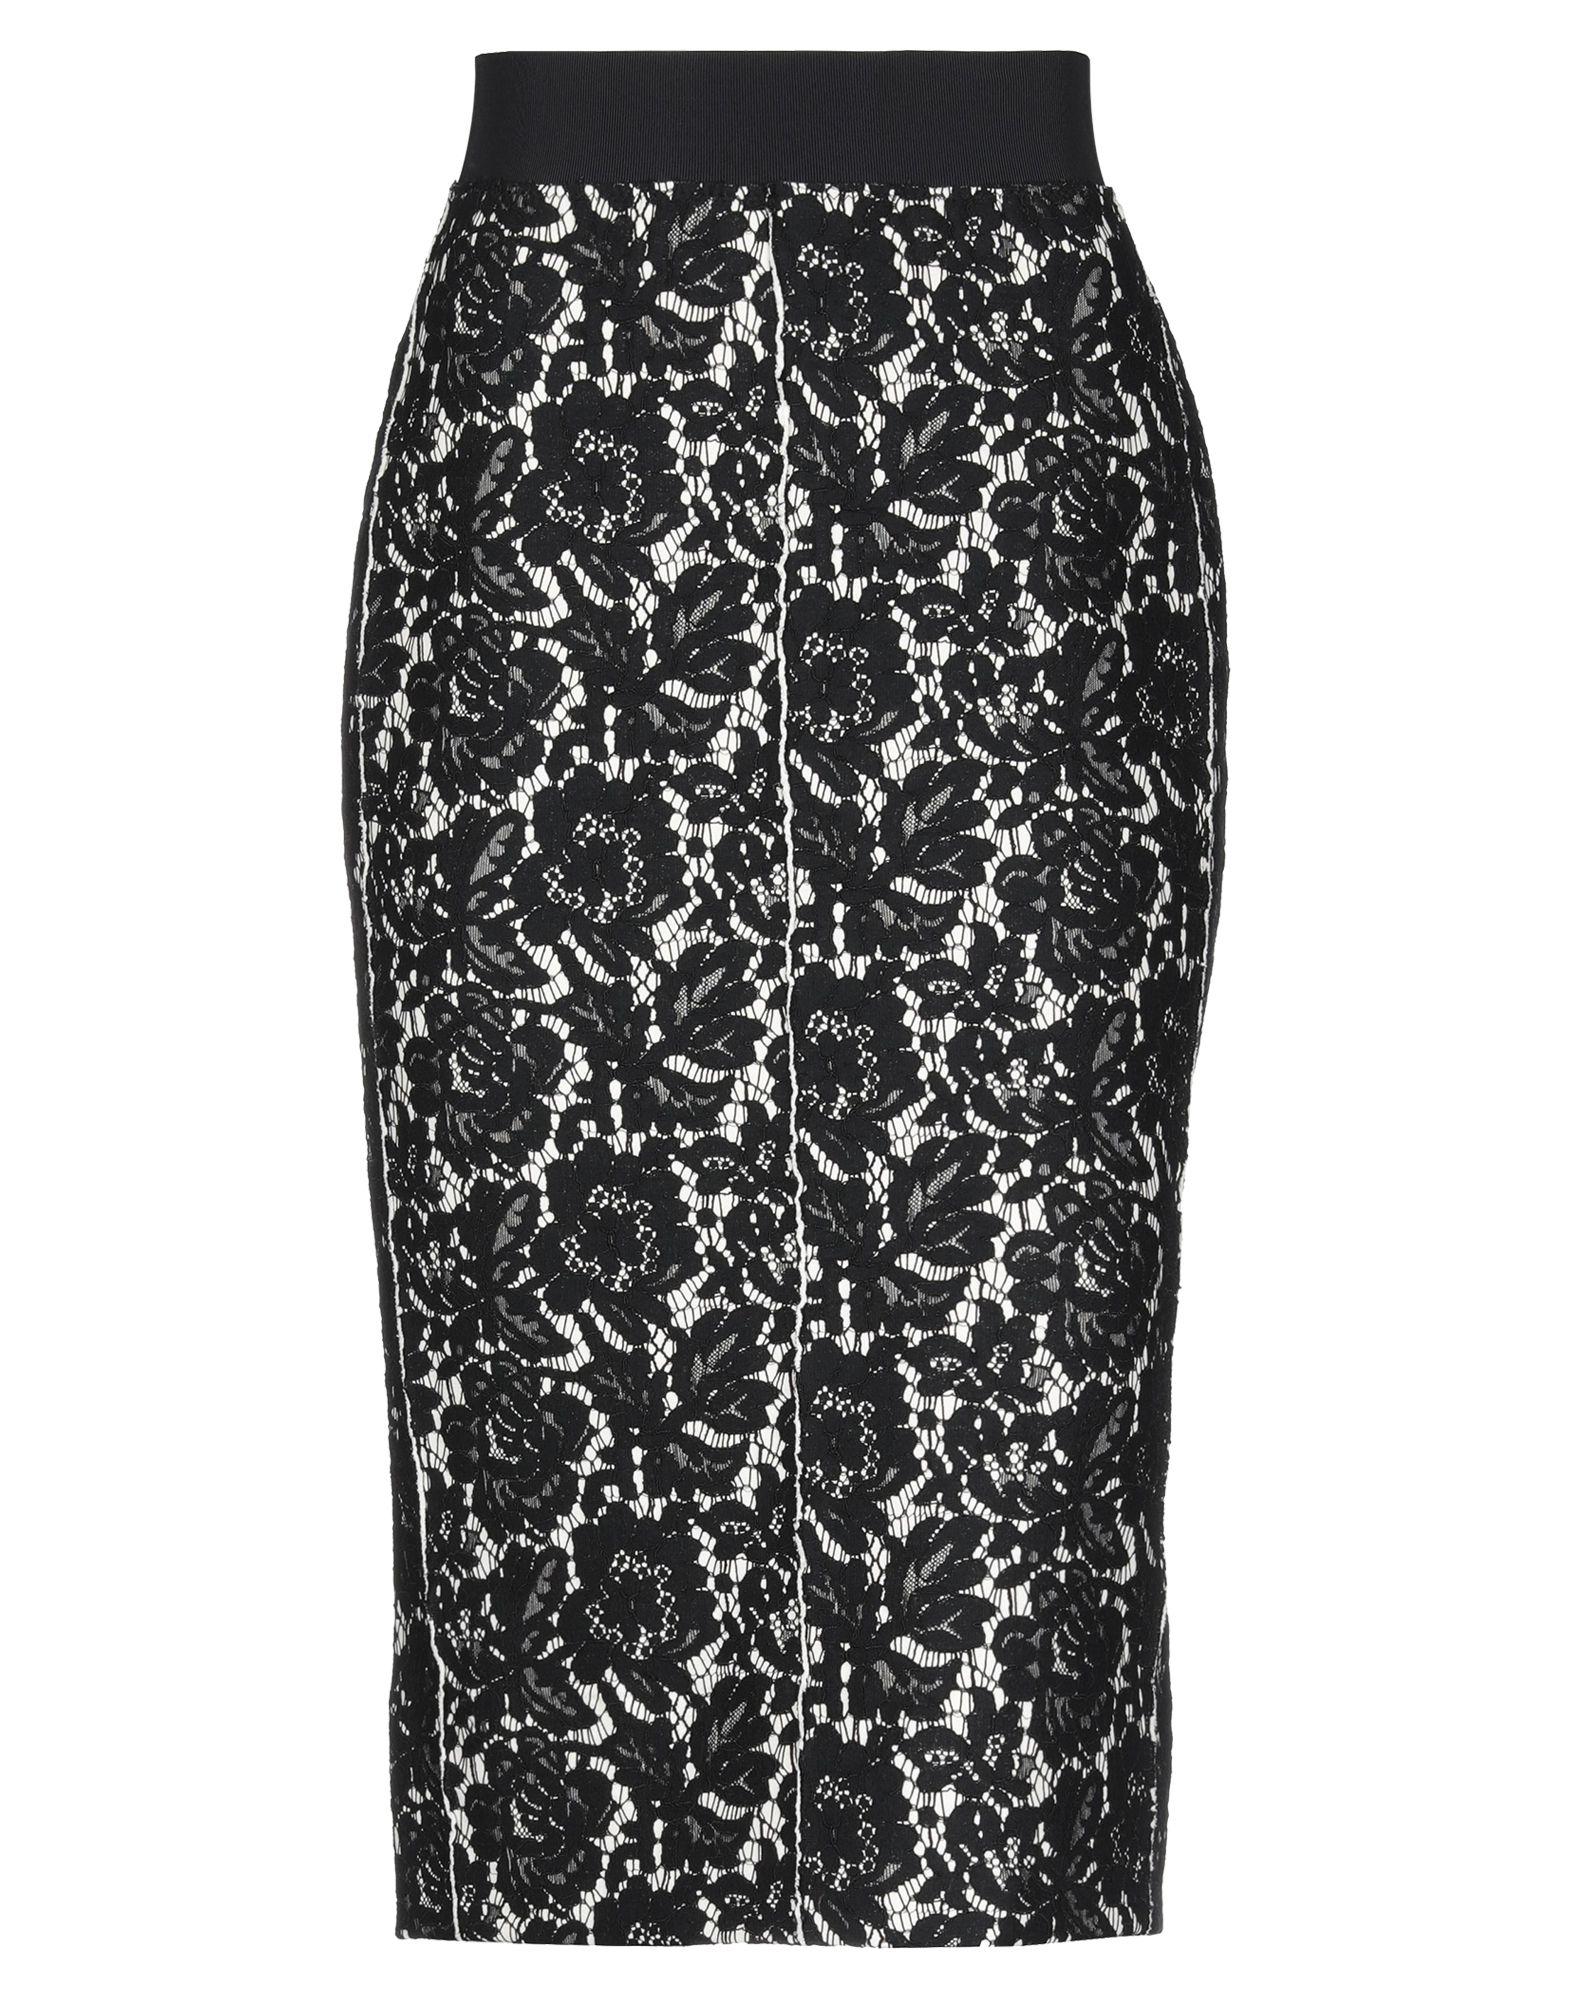 DOROTHEE SCHUMACHER Юбка длиной 3/4 цена